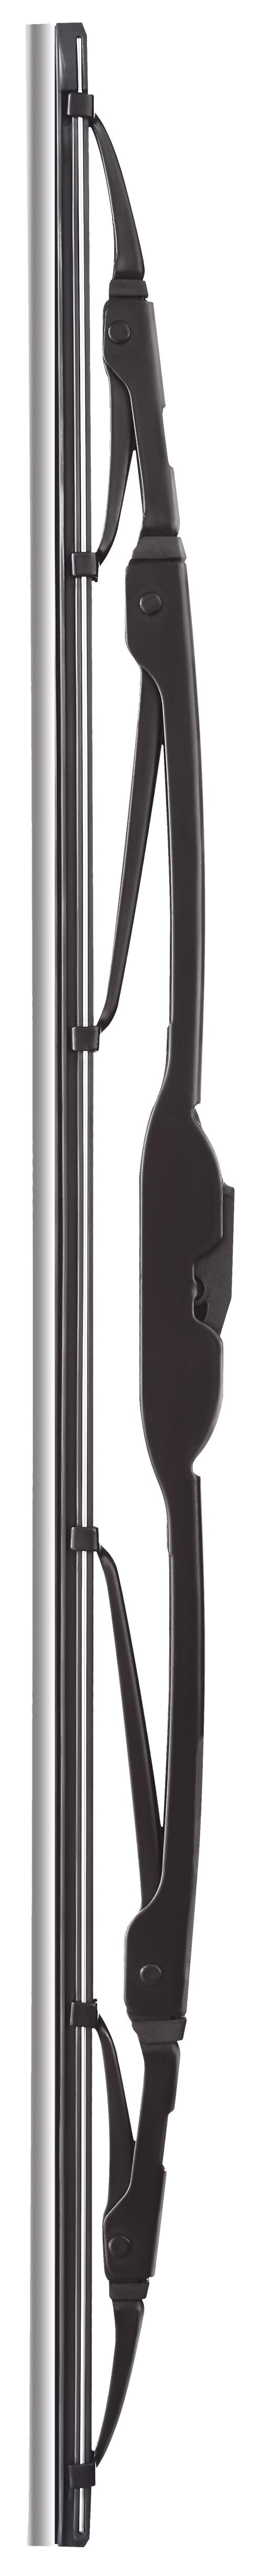 цена на Щетка стеклоочистителя Hito HCL-16